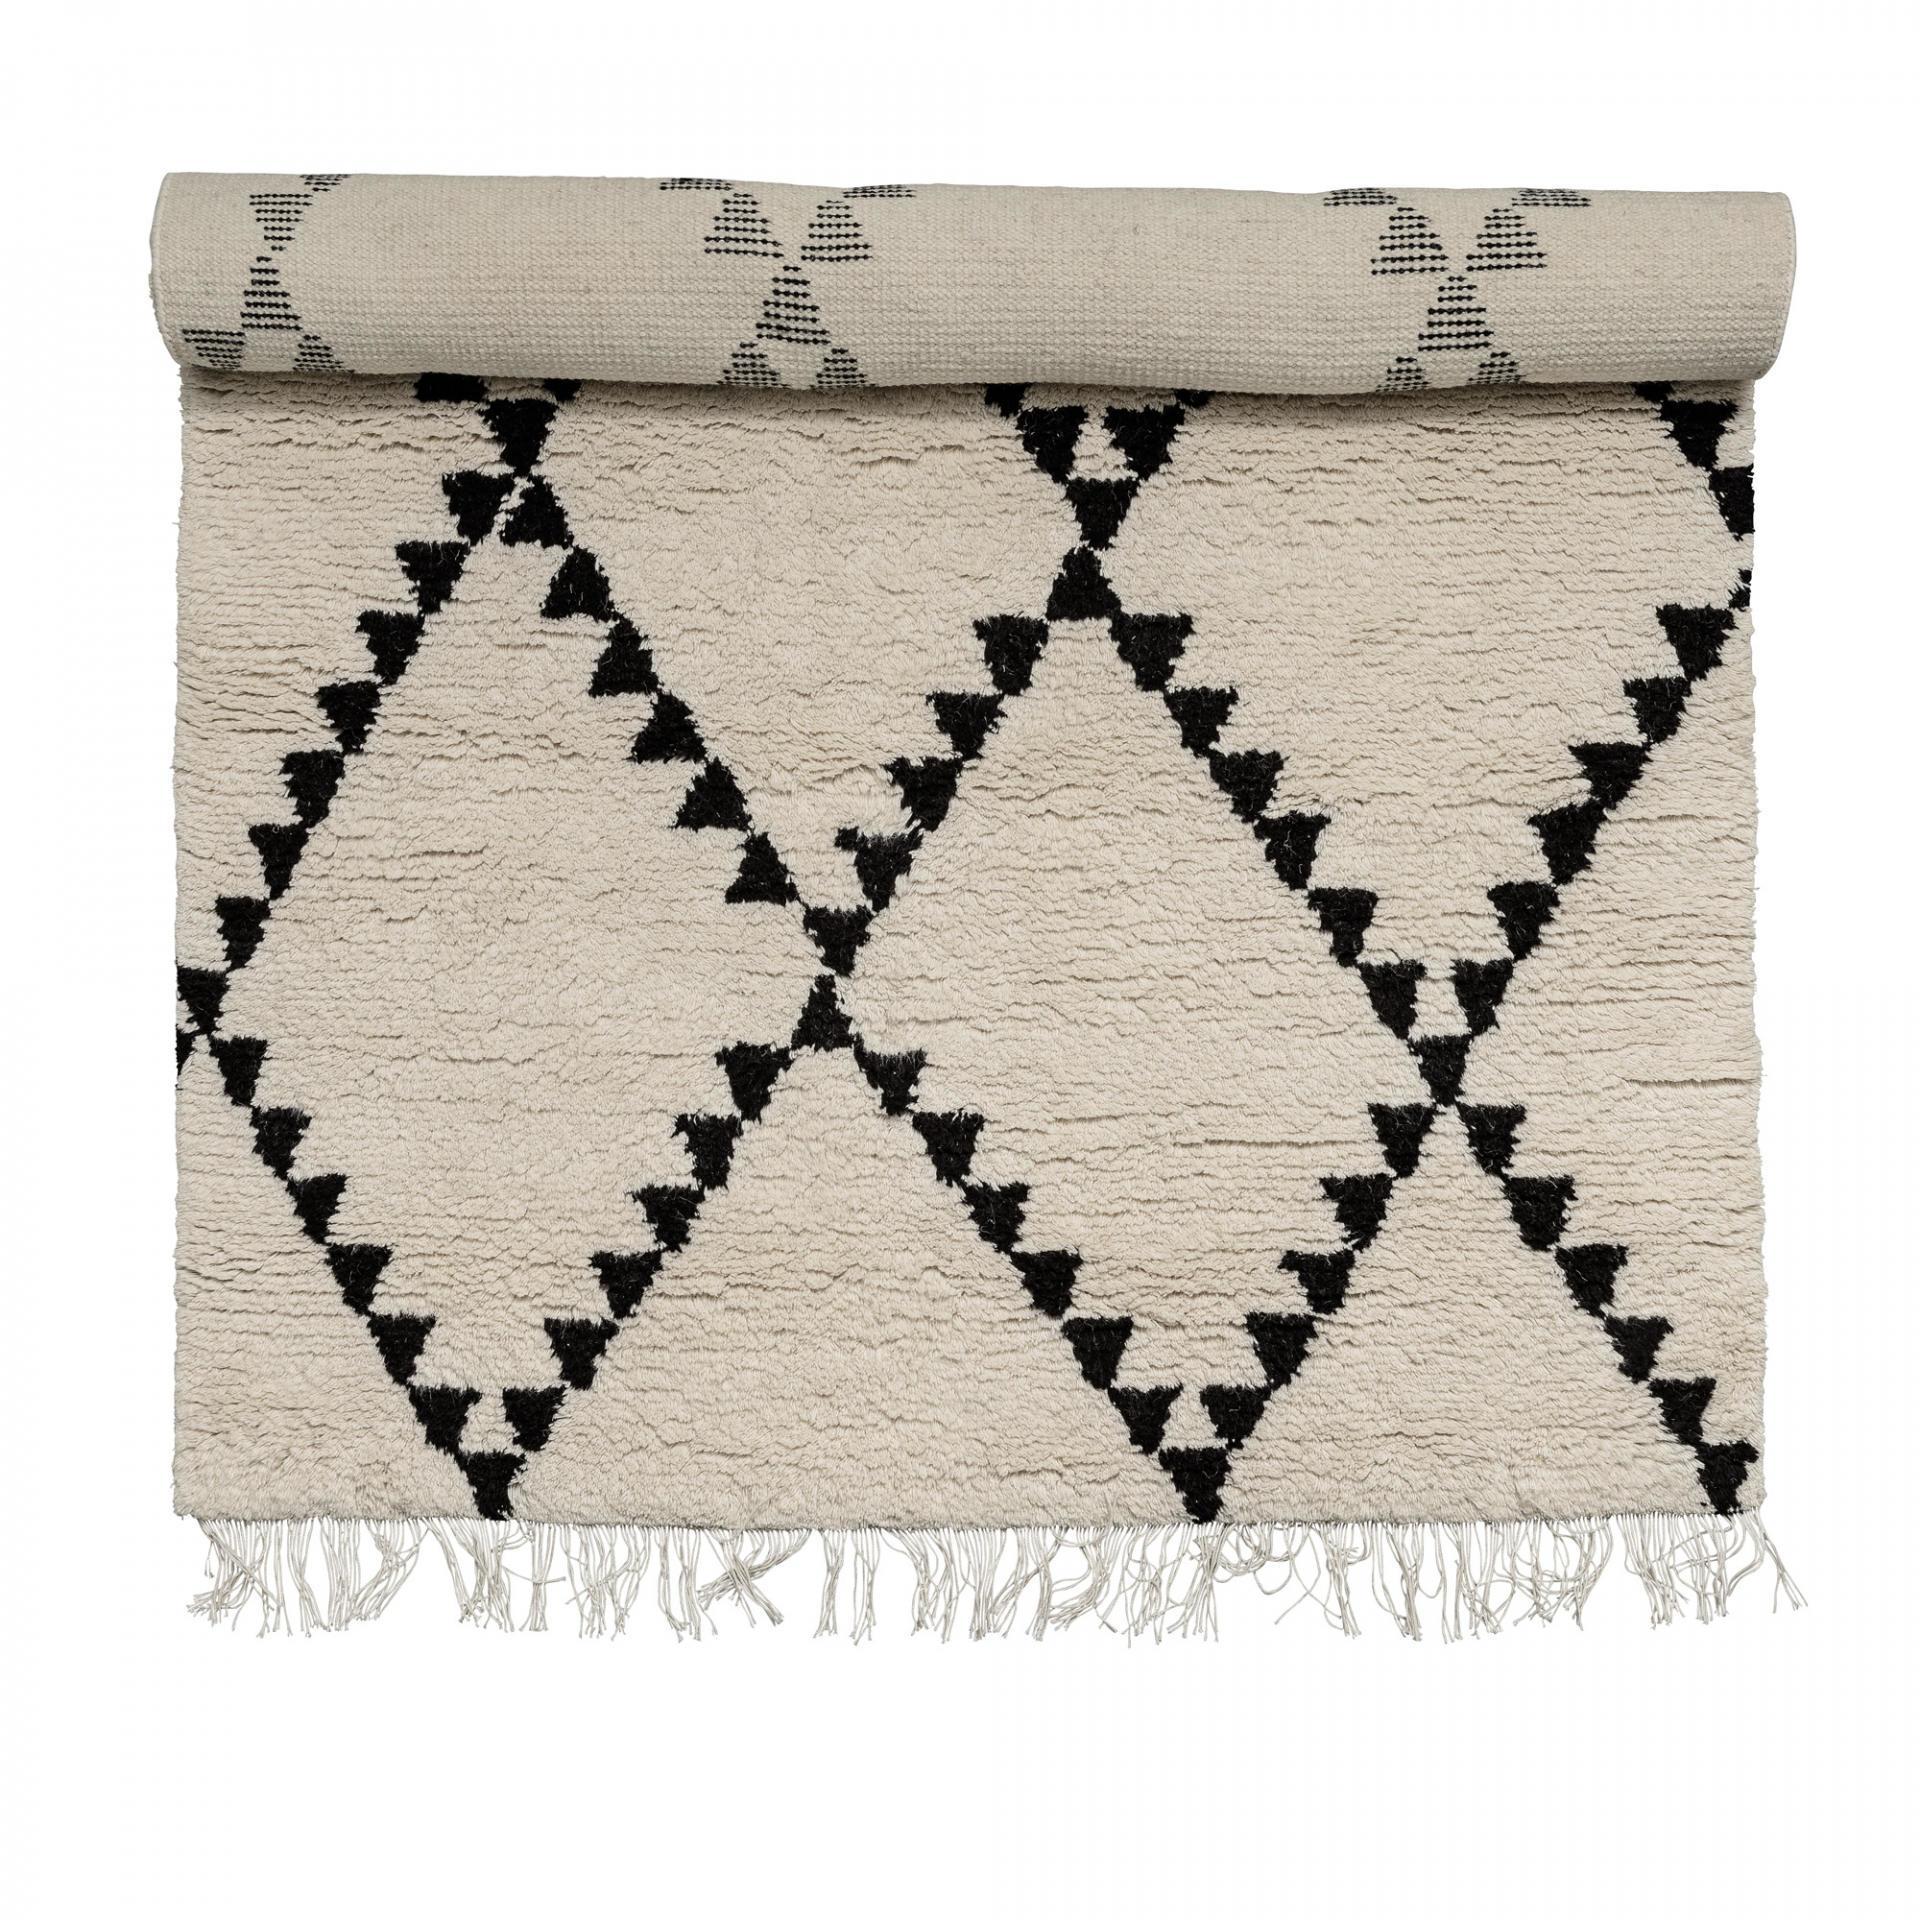 Vlněný koberec Triangle 140x200 cm, černá barva, bílá barva, textil Bílá